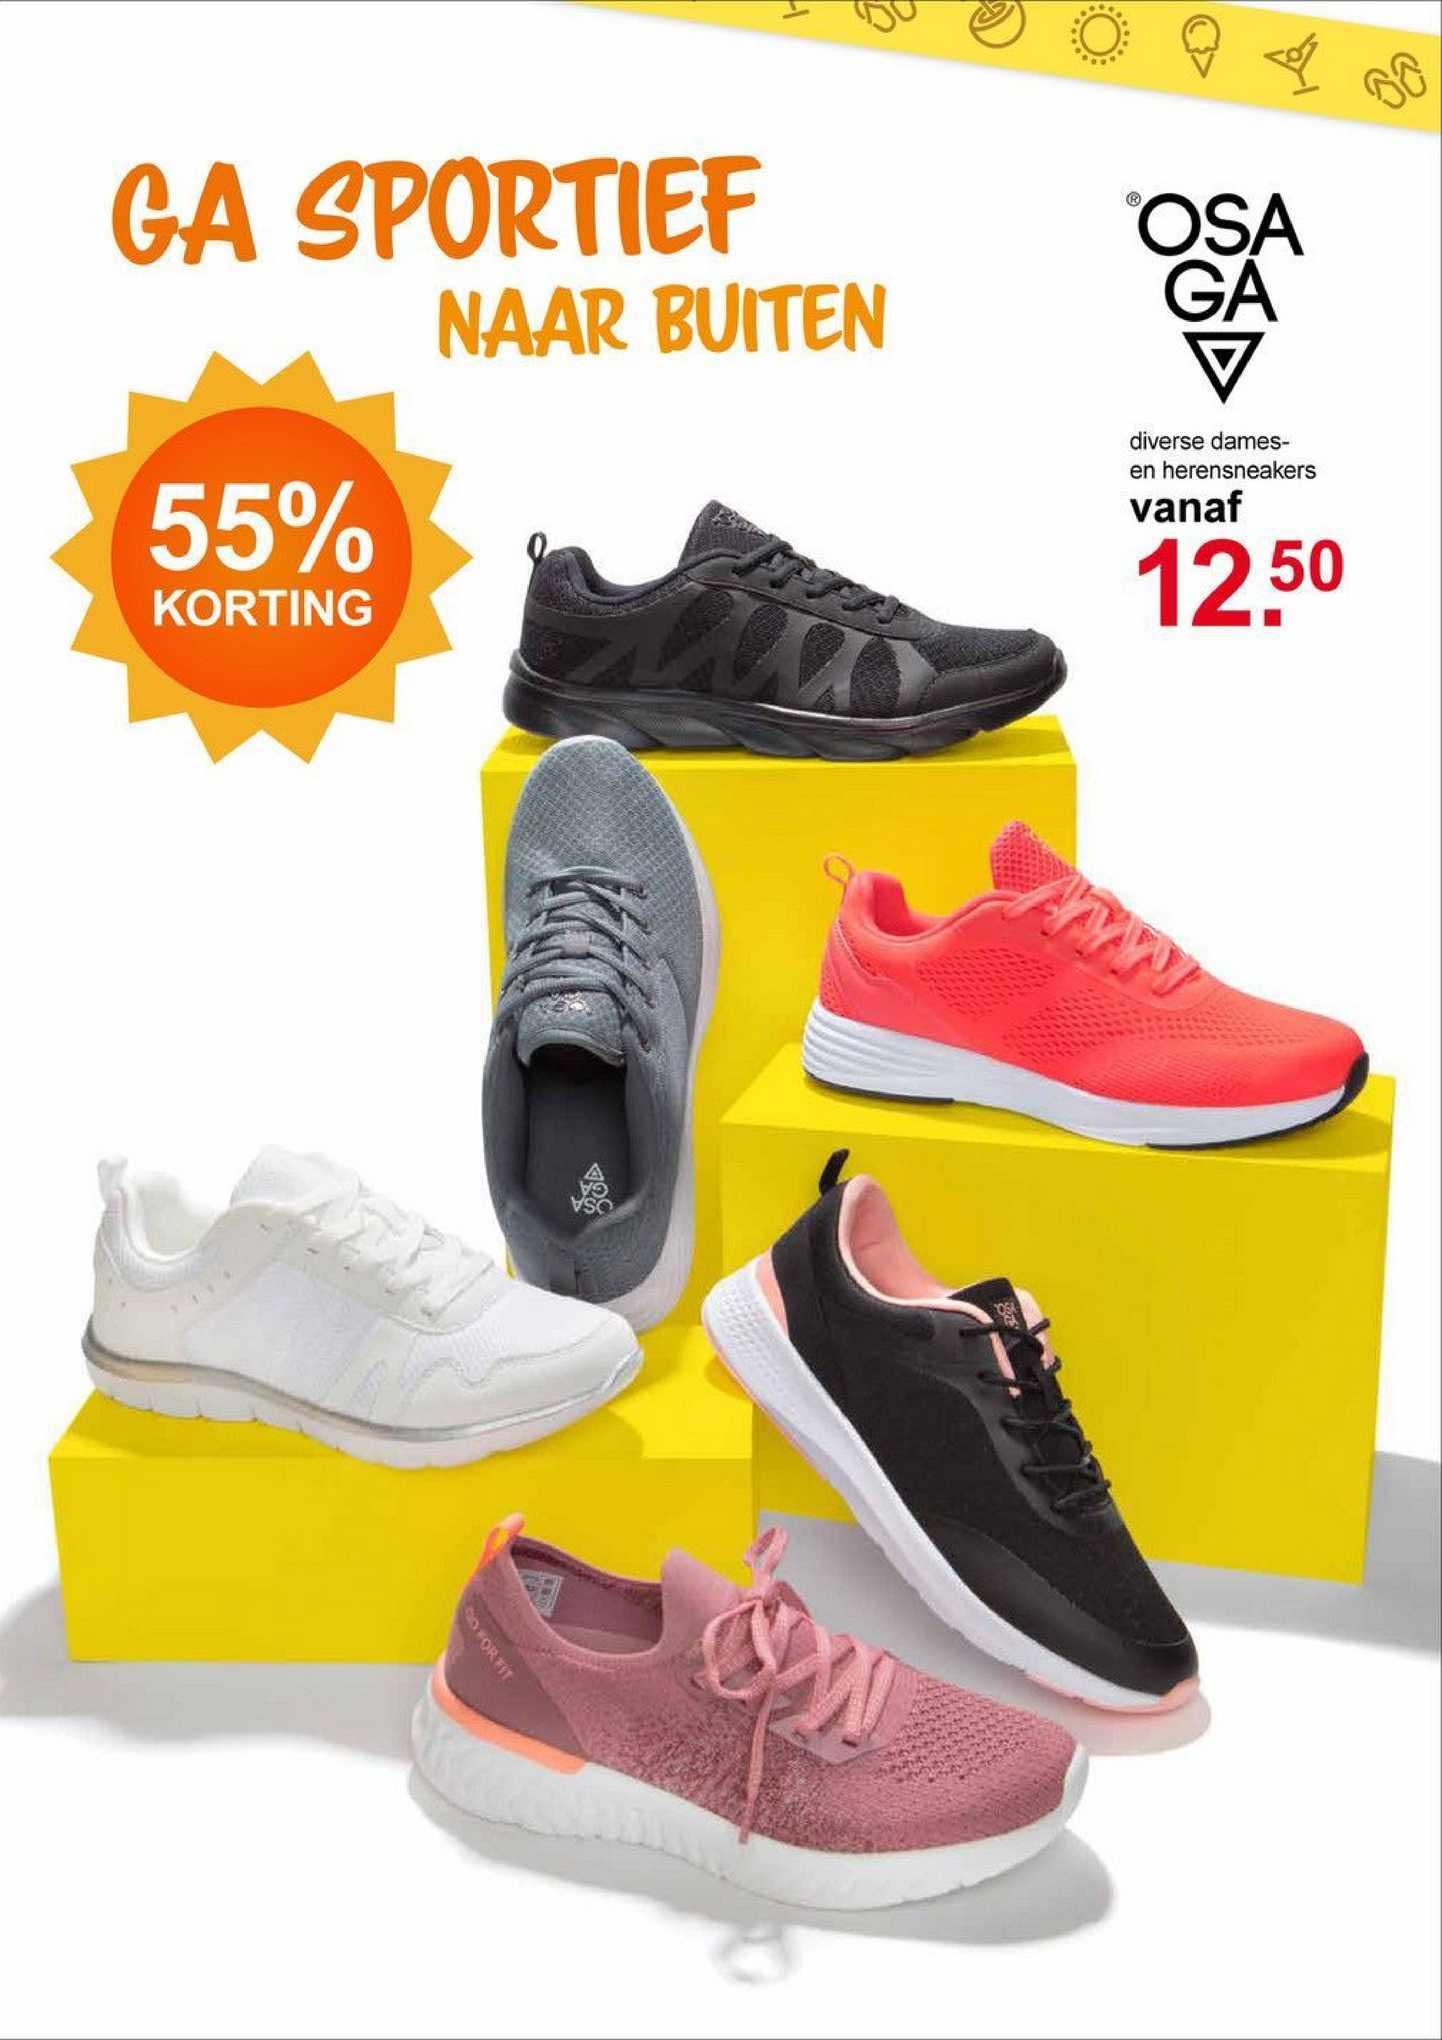 Scapino Osaga Diverse Dames- En Herensneakers 55% Korting